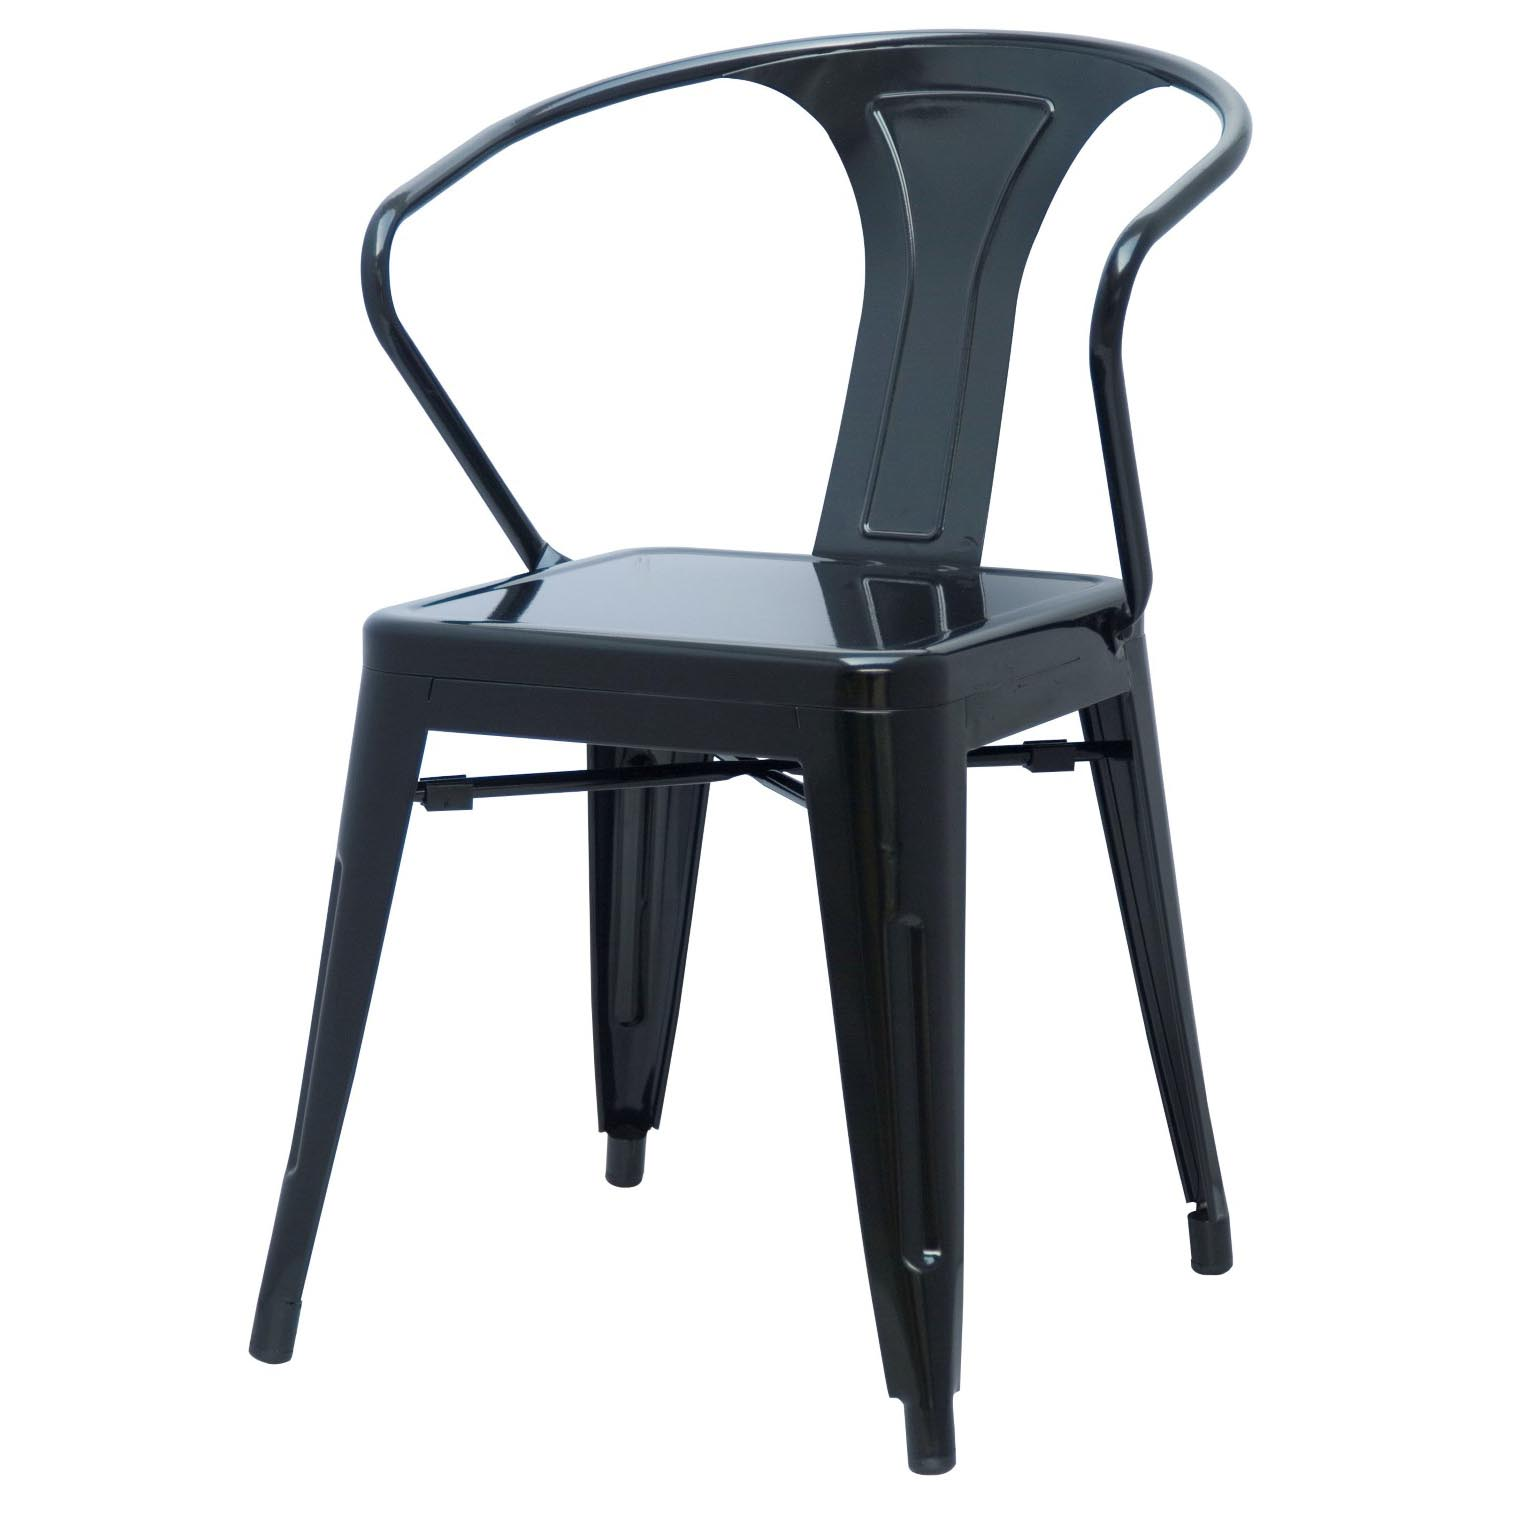 907_1152_l  sc 1 st  Boulevard Urban Living & Metropolis Metal Arm Chair Black - Boulevard Urban Living